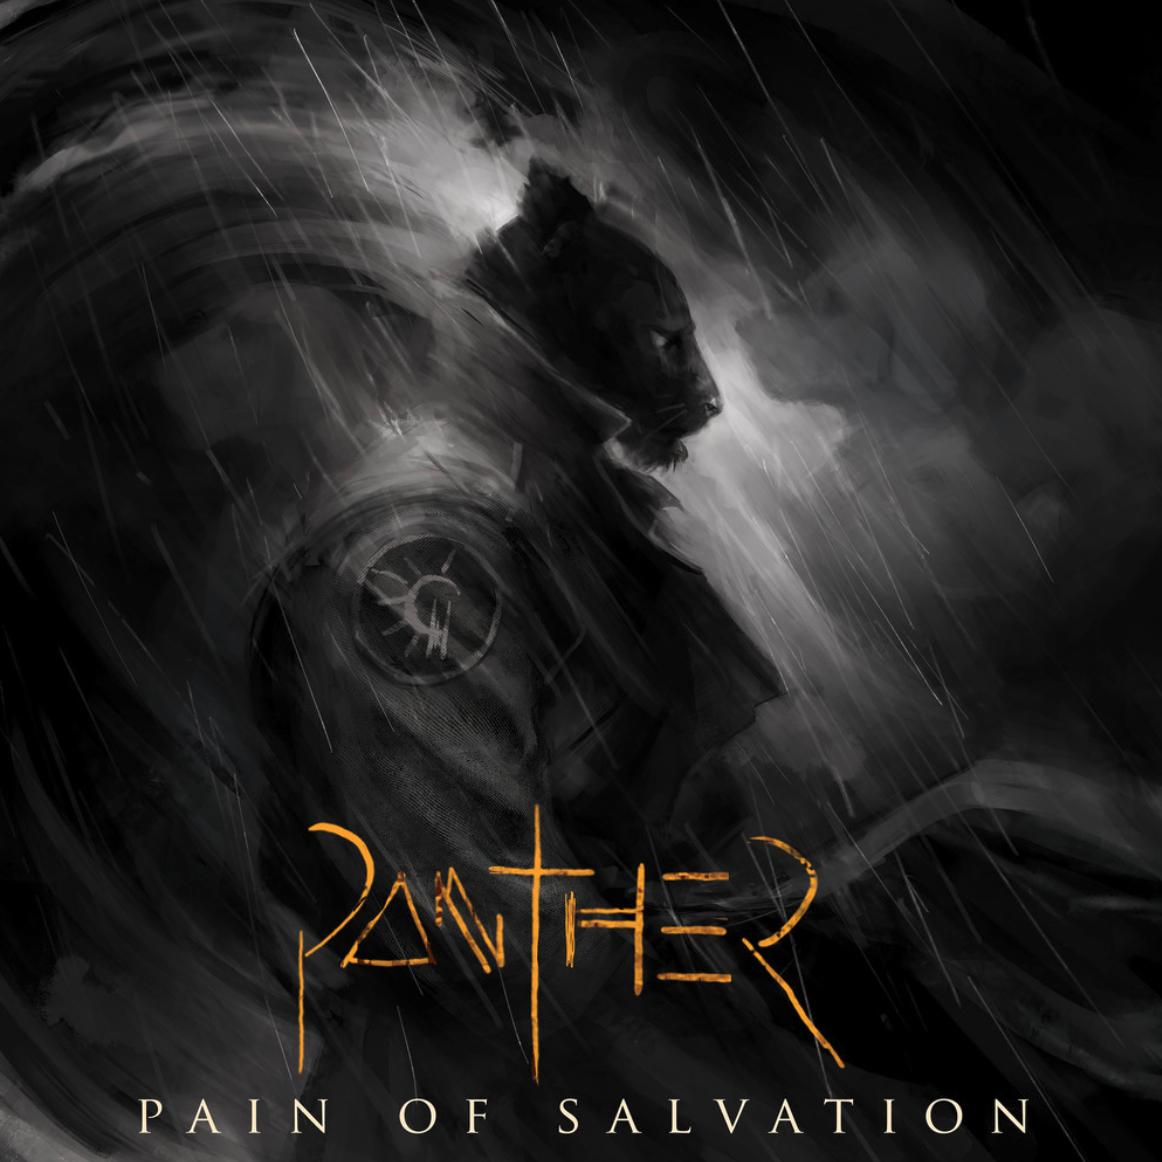 Pain Of Salvation: Panther (2020).